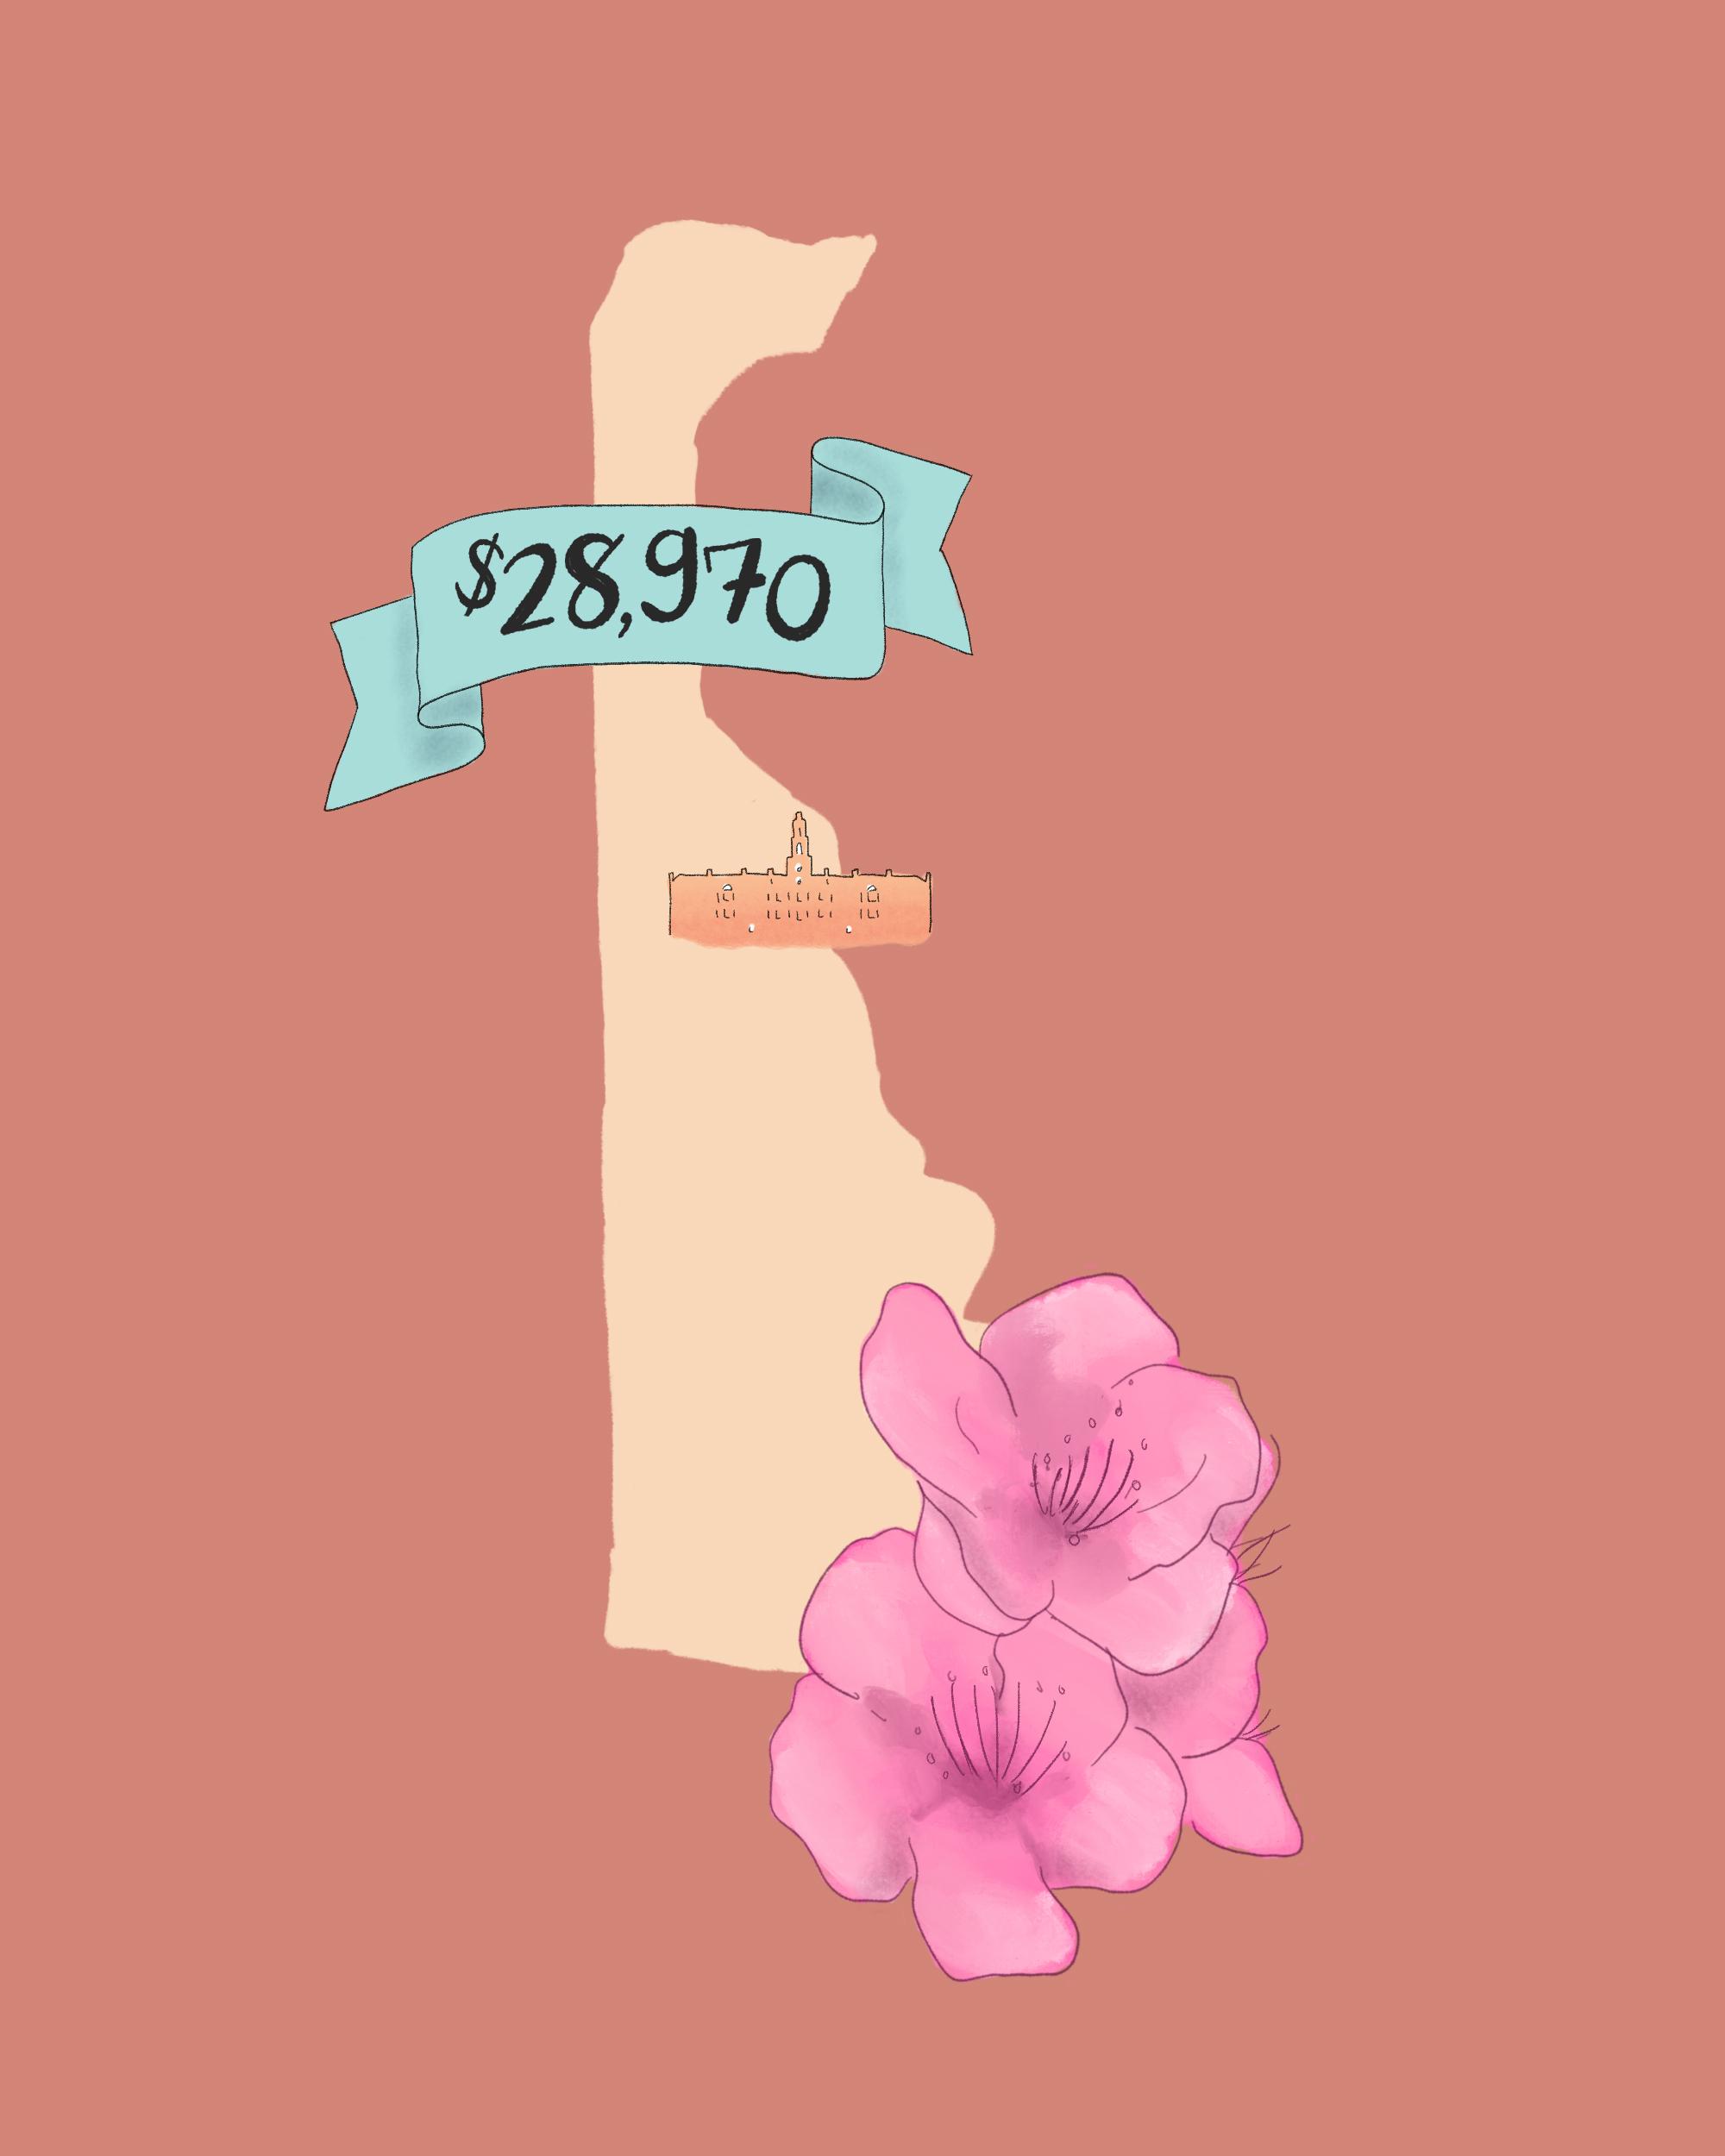 state wedding costs illustration delaware